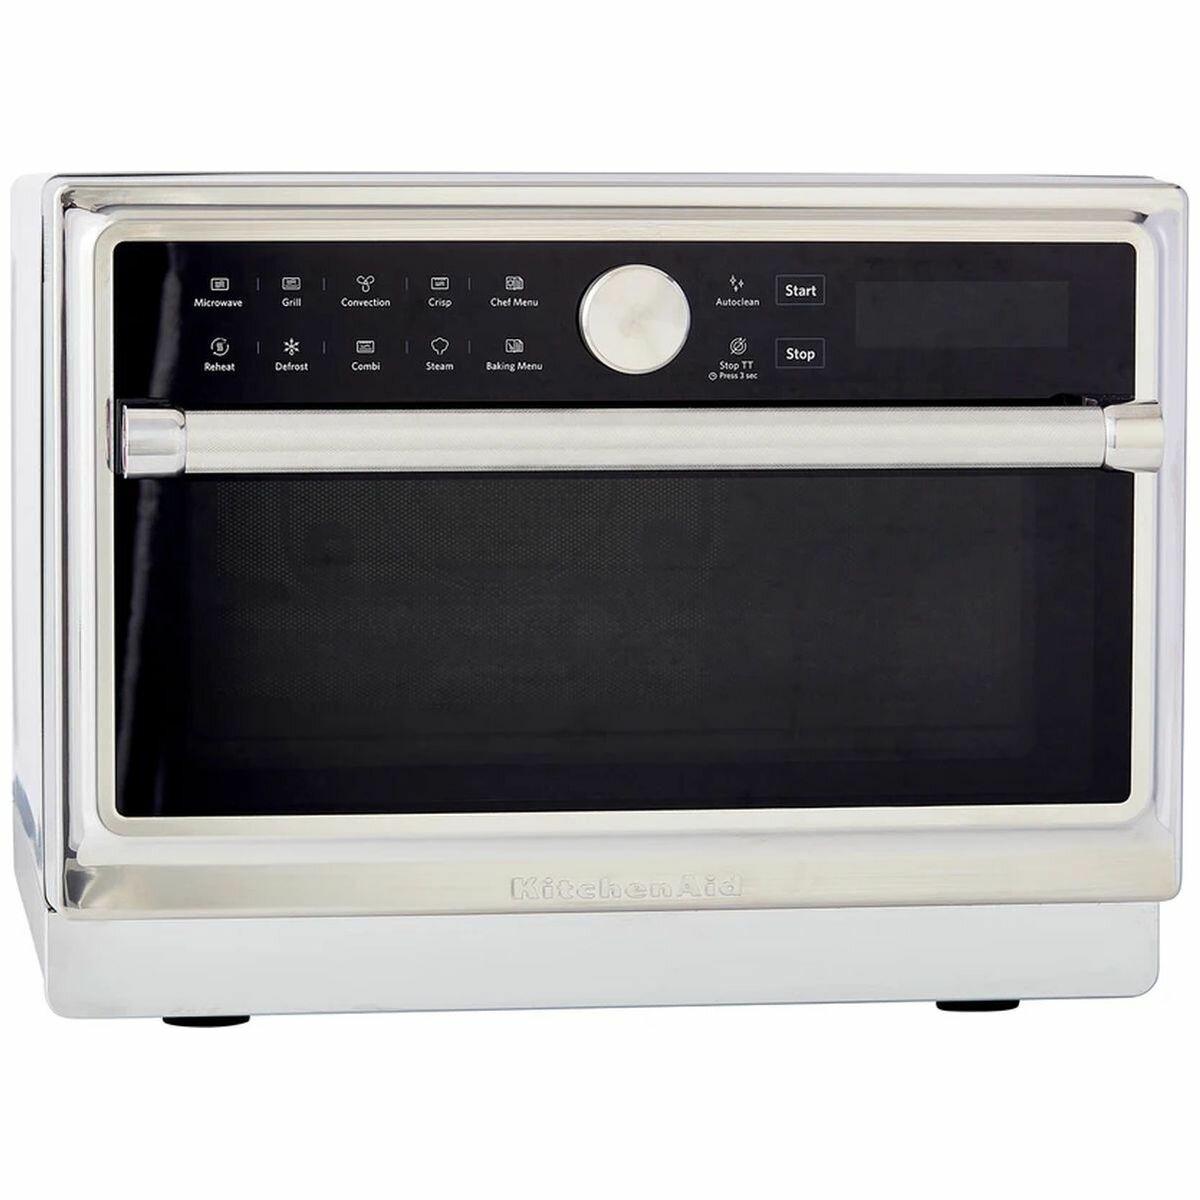 kitchenaid 33l bake assist freestanding microwave oven 5kmw276asl